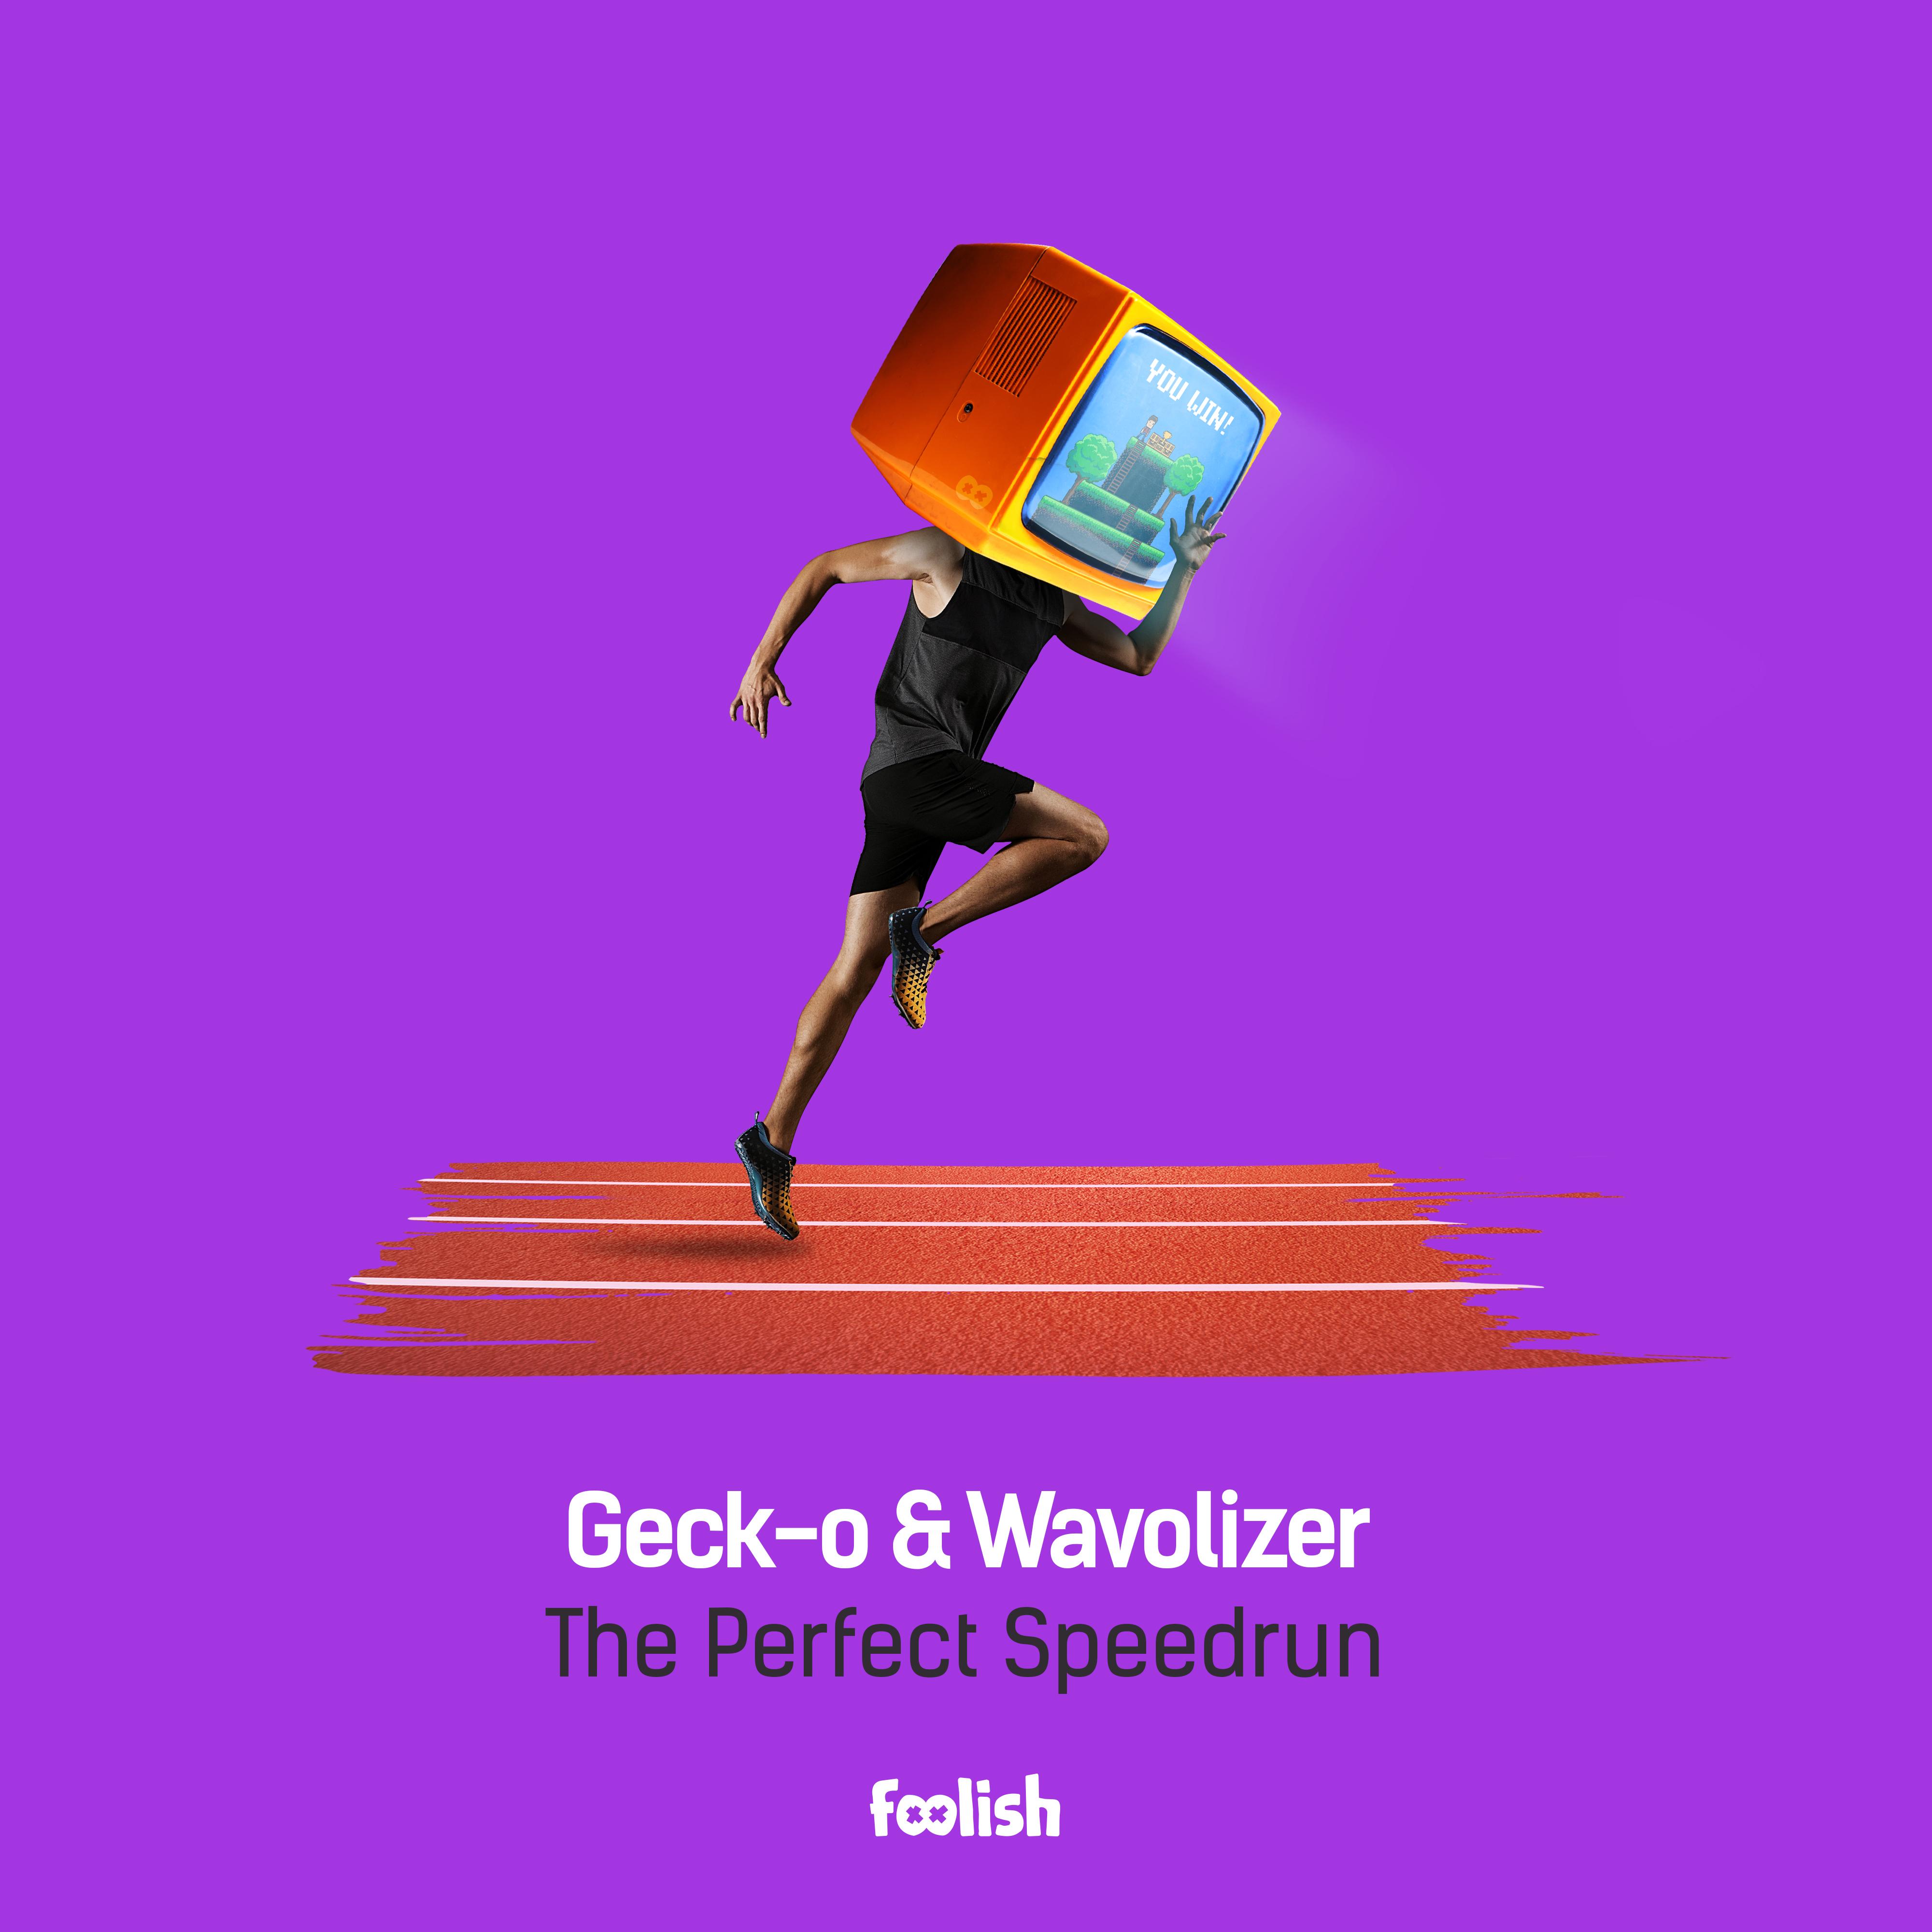 Geck-o & Wavolizer - The Perfect Speedrun